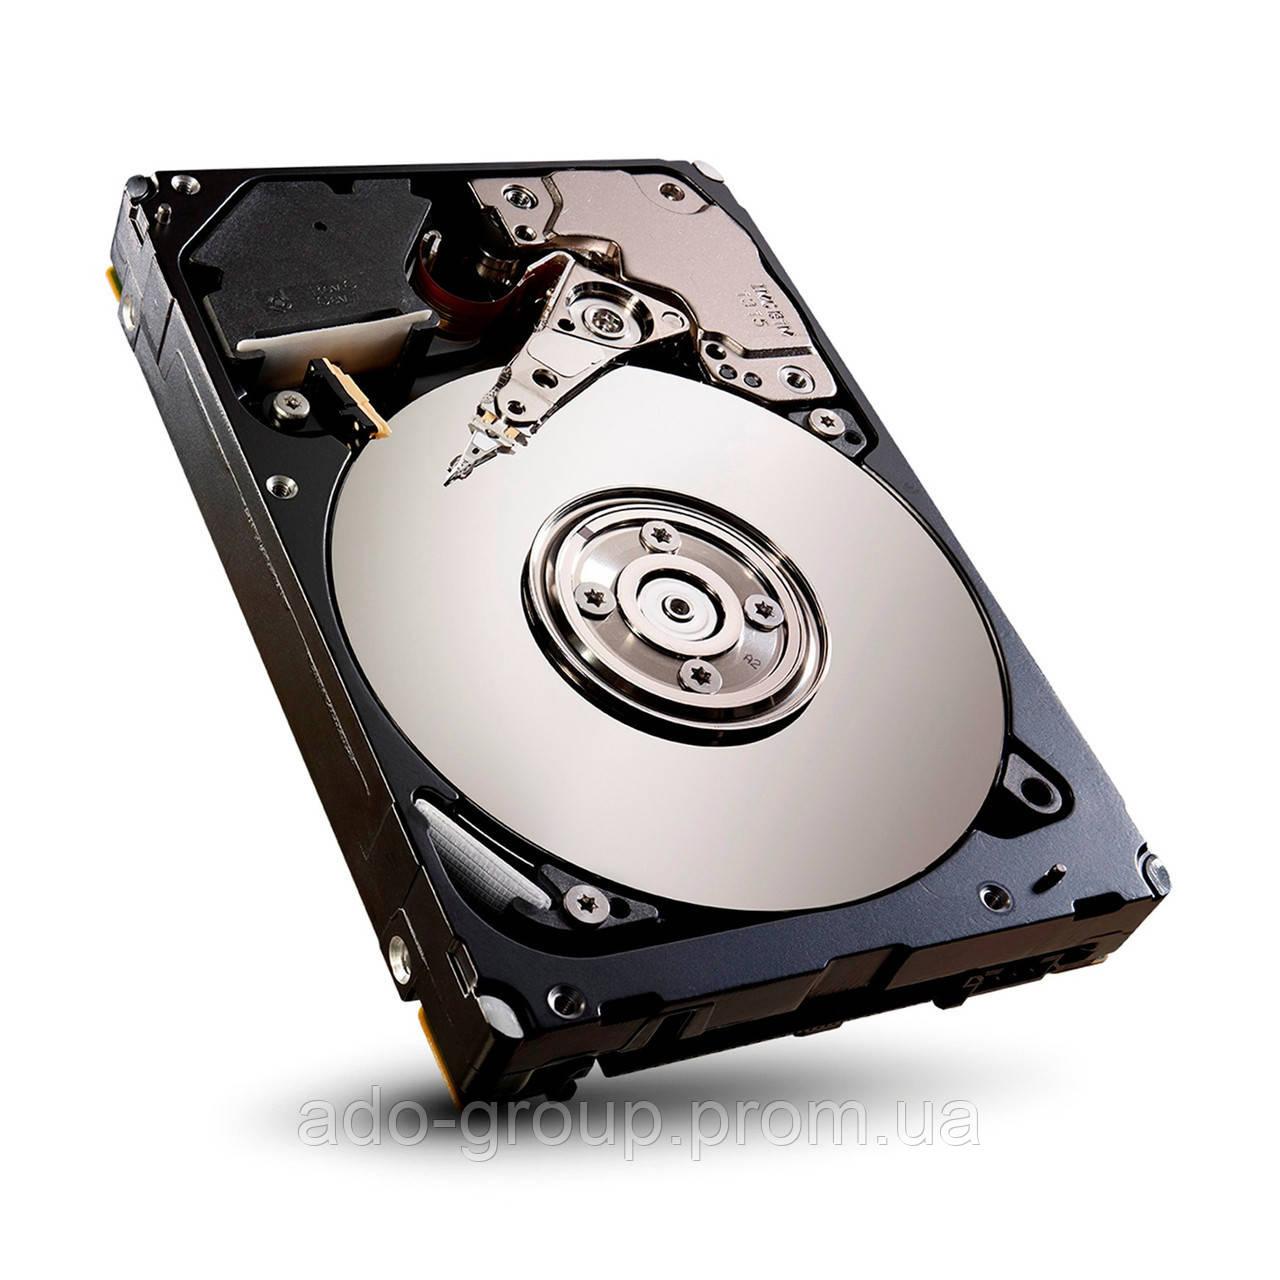 "389343-001 Жесткий диск HP 72GB SAS 15K  3.5"" +"